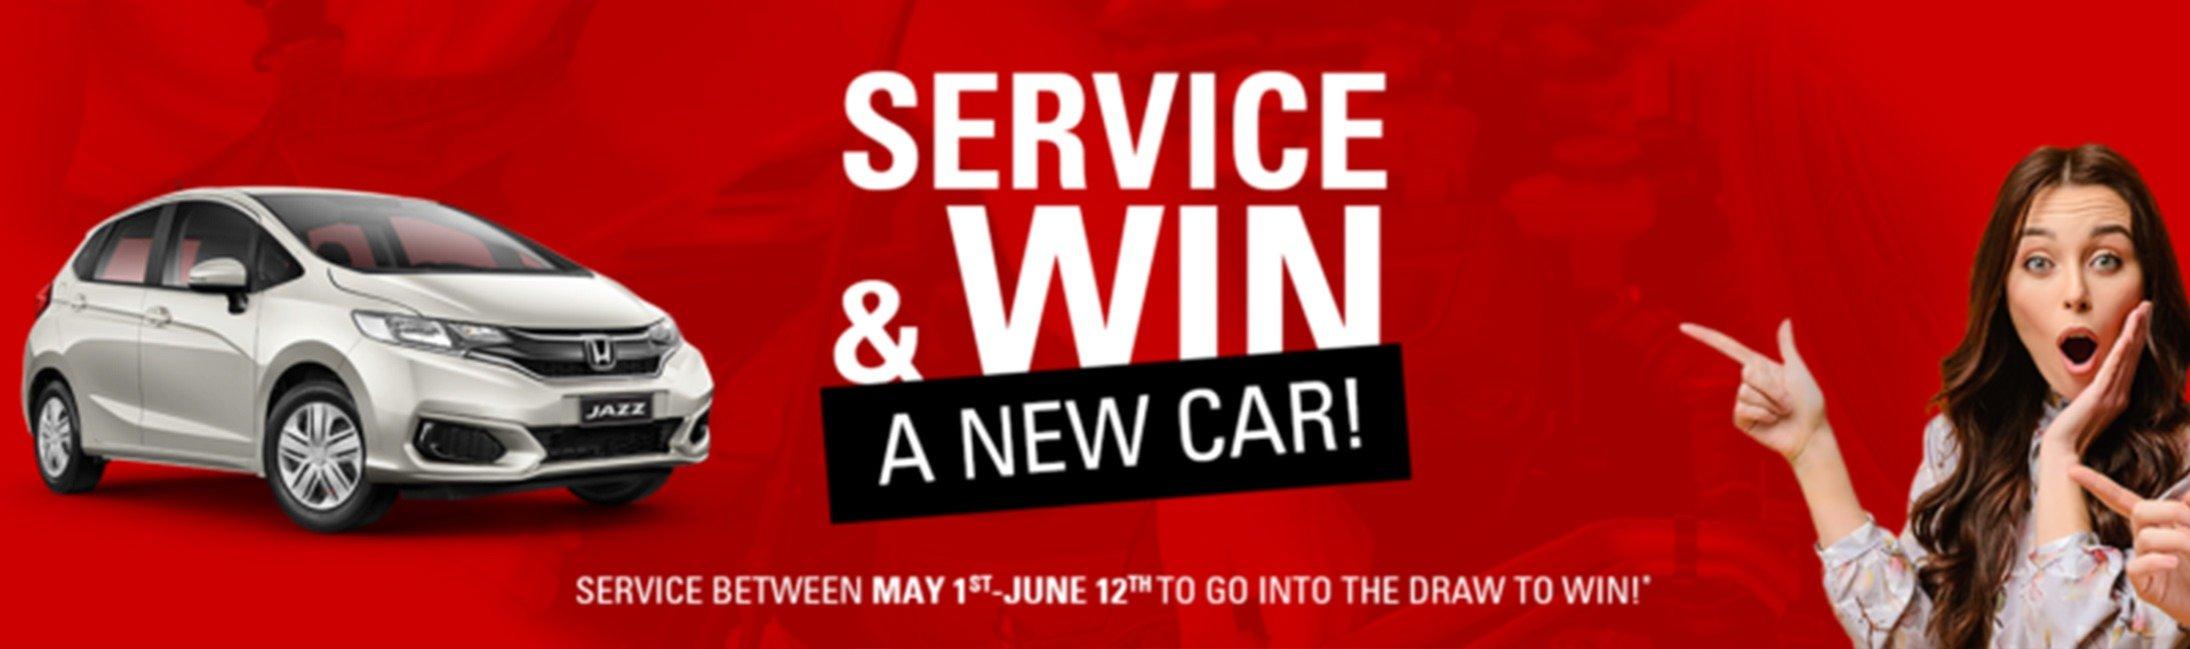 Service & Win a New Honda